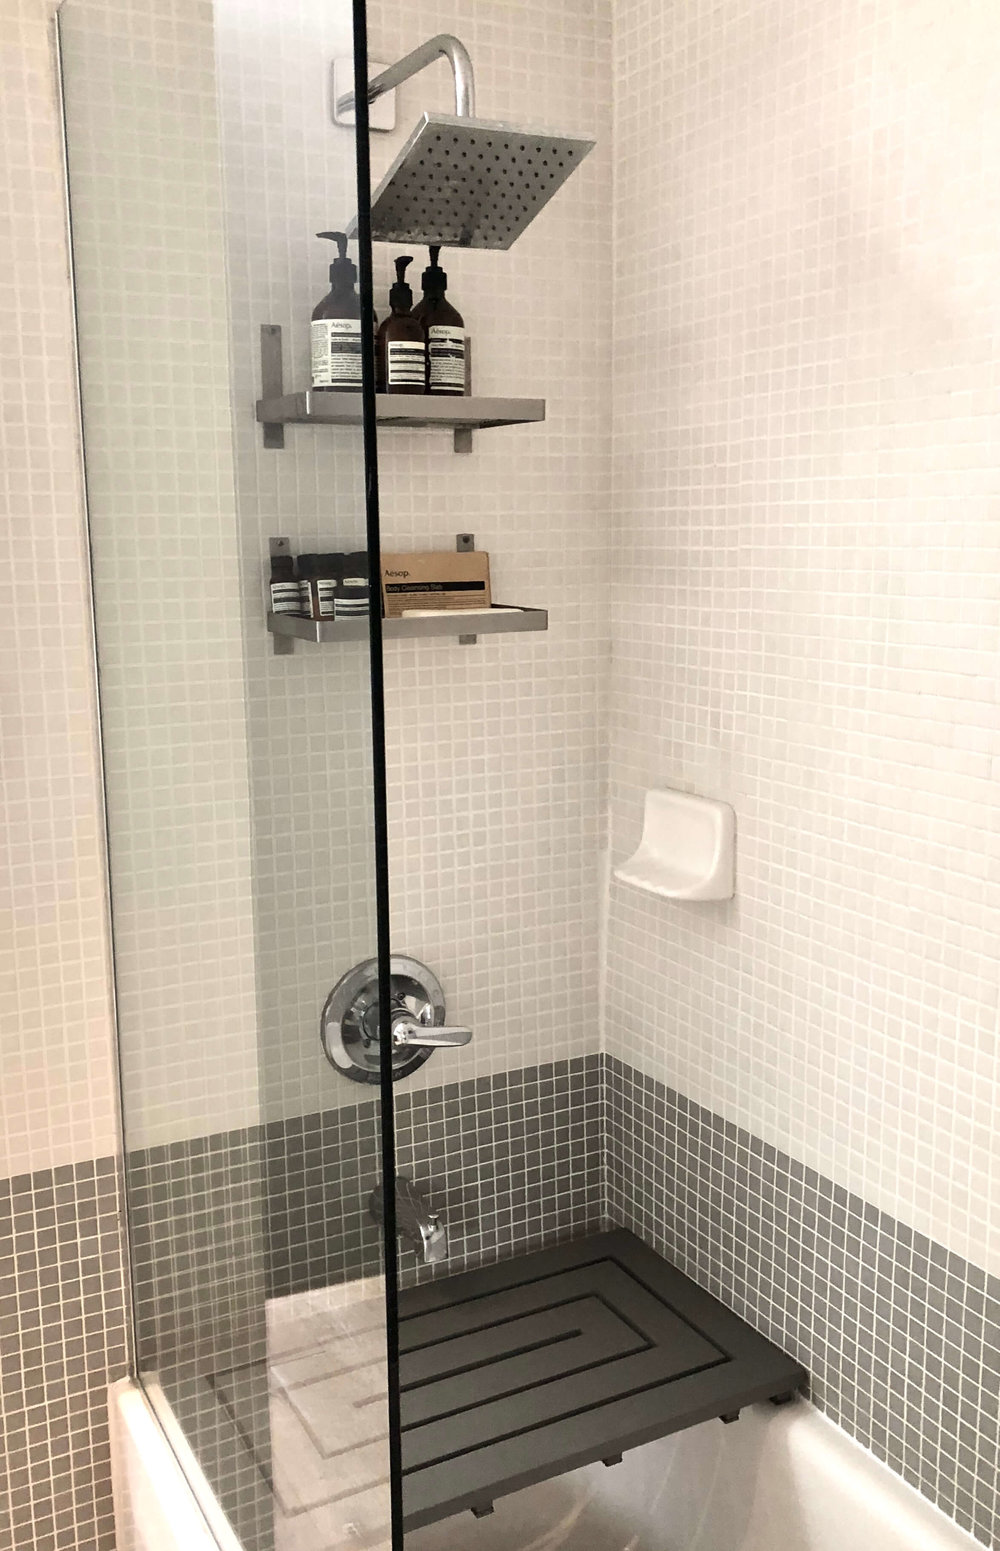 Modern bathroom shower and tub #shower #mosaictile #modernbathroom